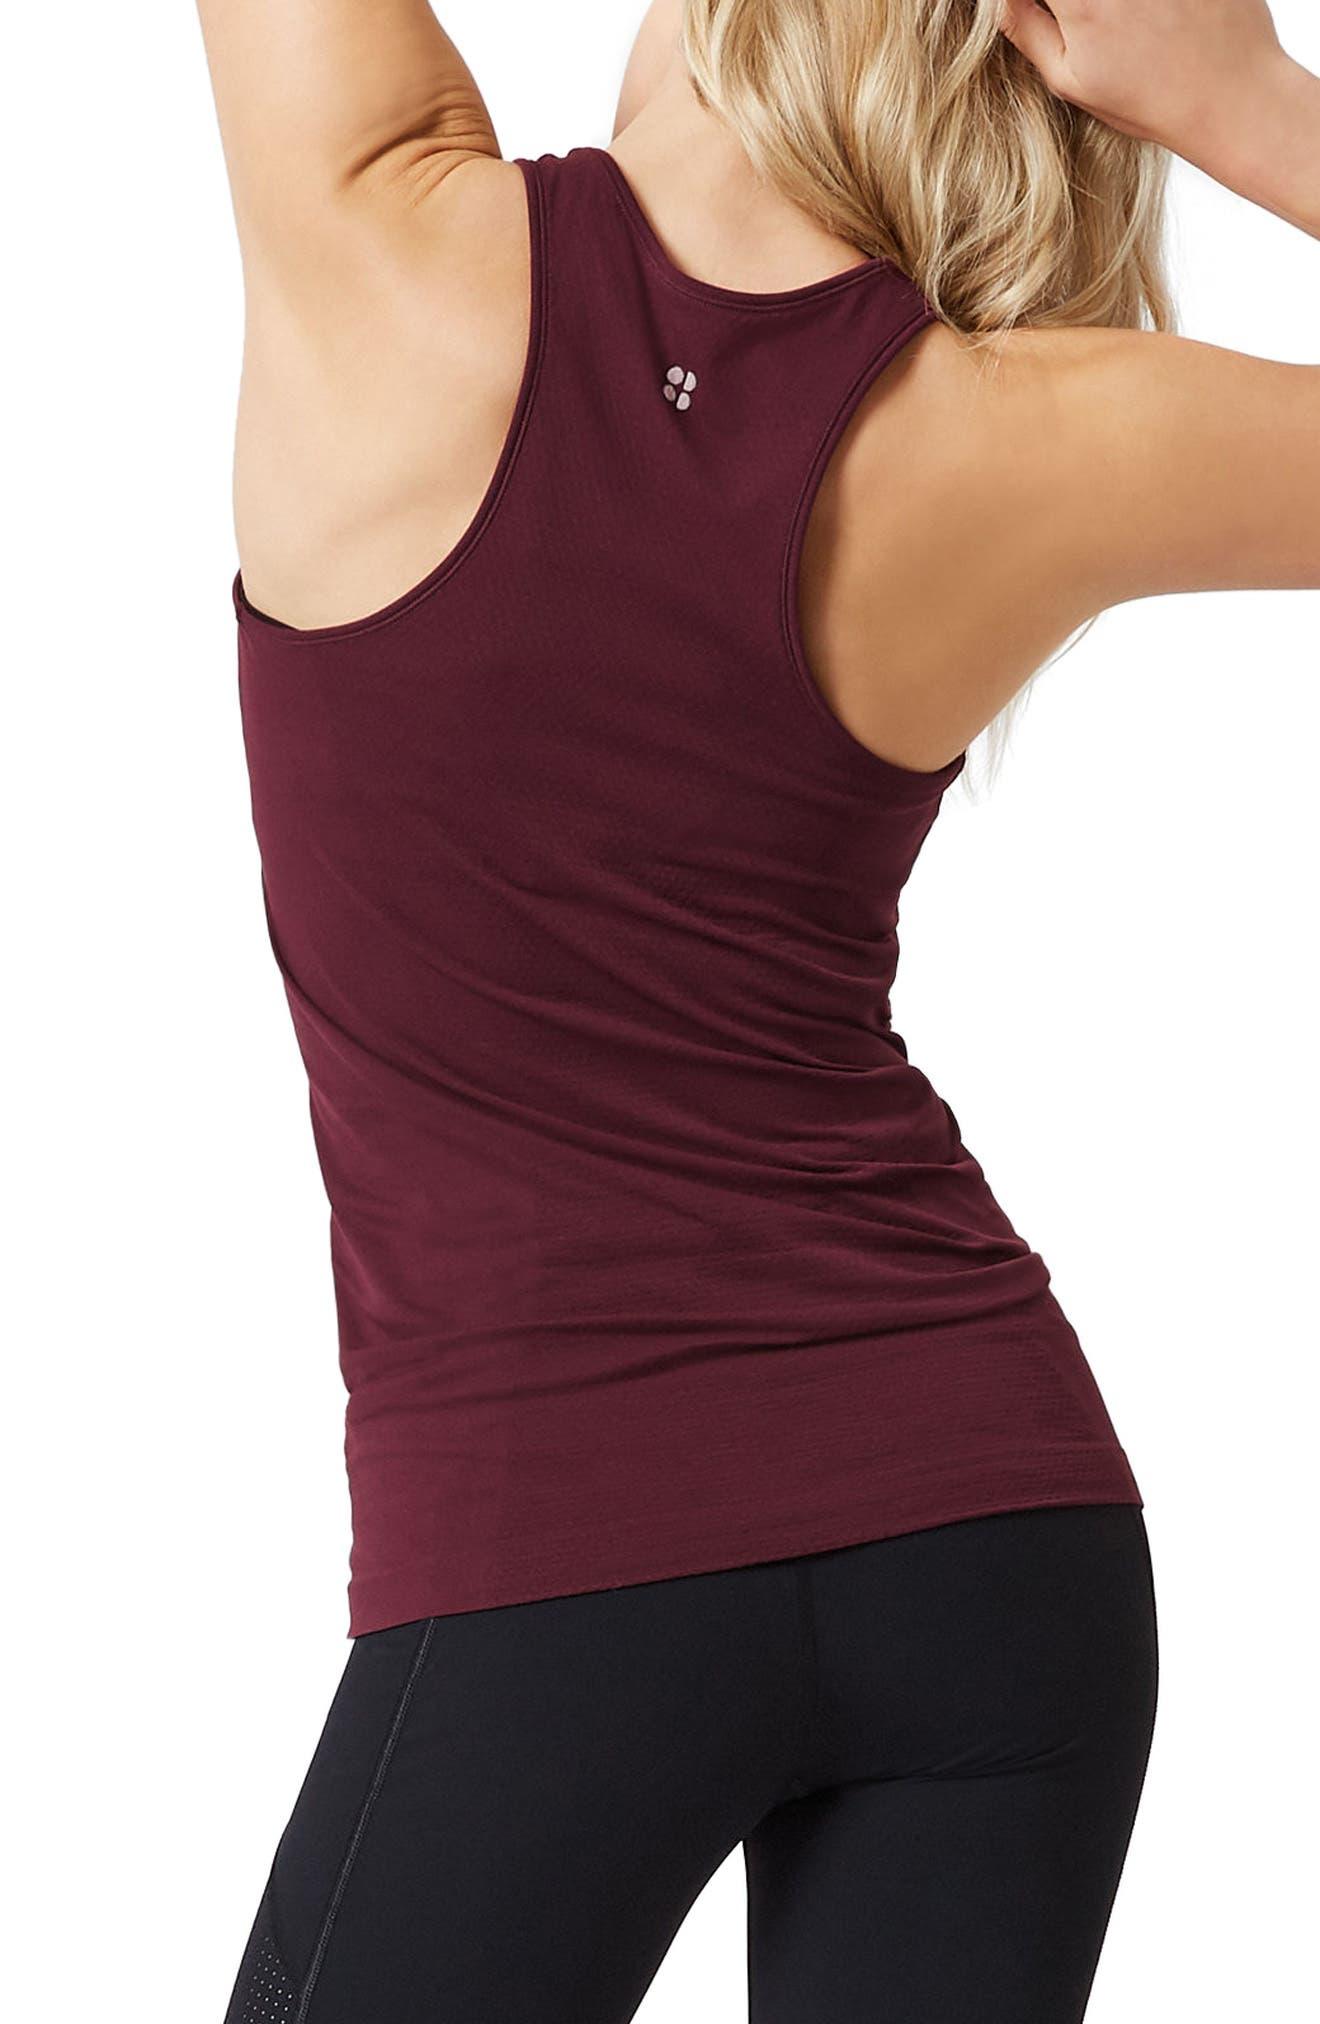 Athlete Seamless Workout Tank,                             Alternate thumbnail 2, color,                             Oxblood